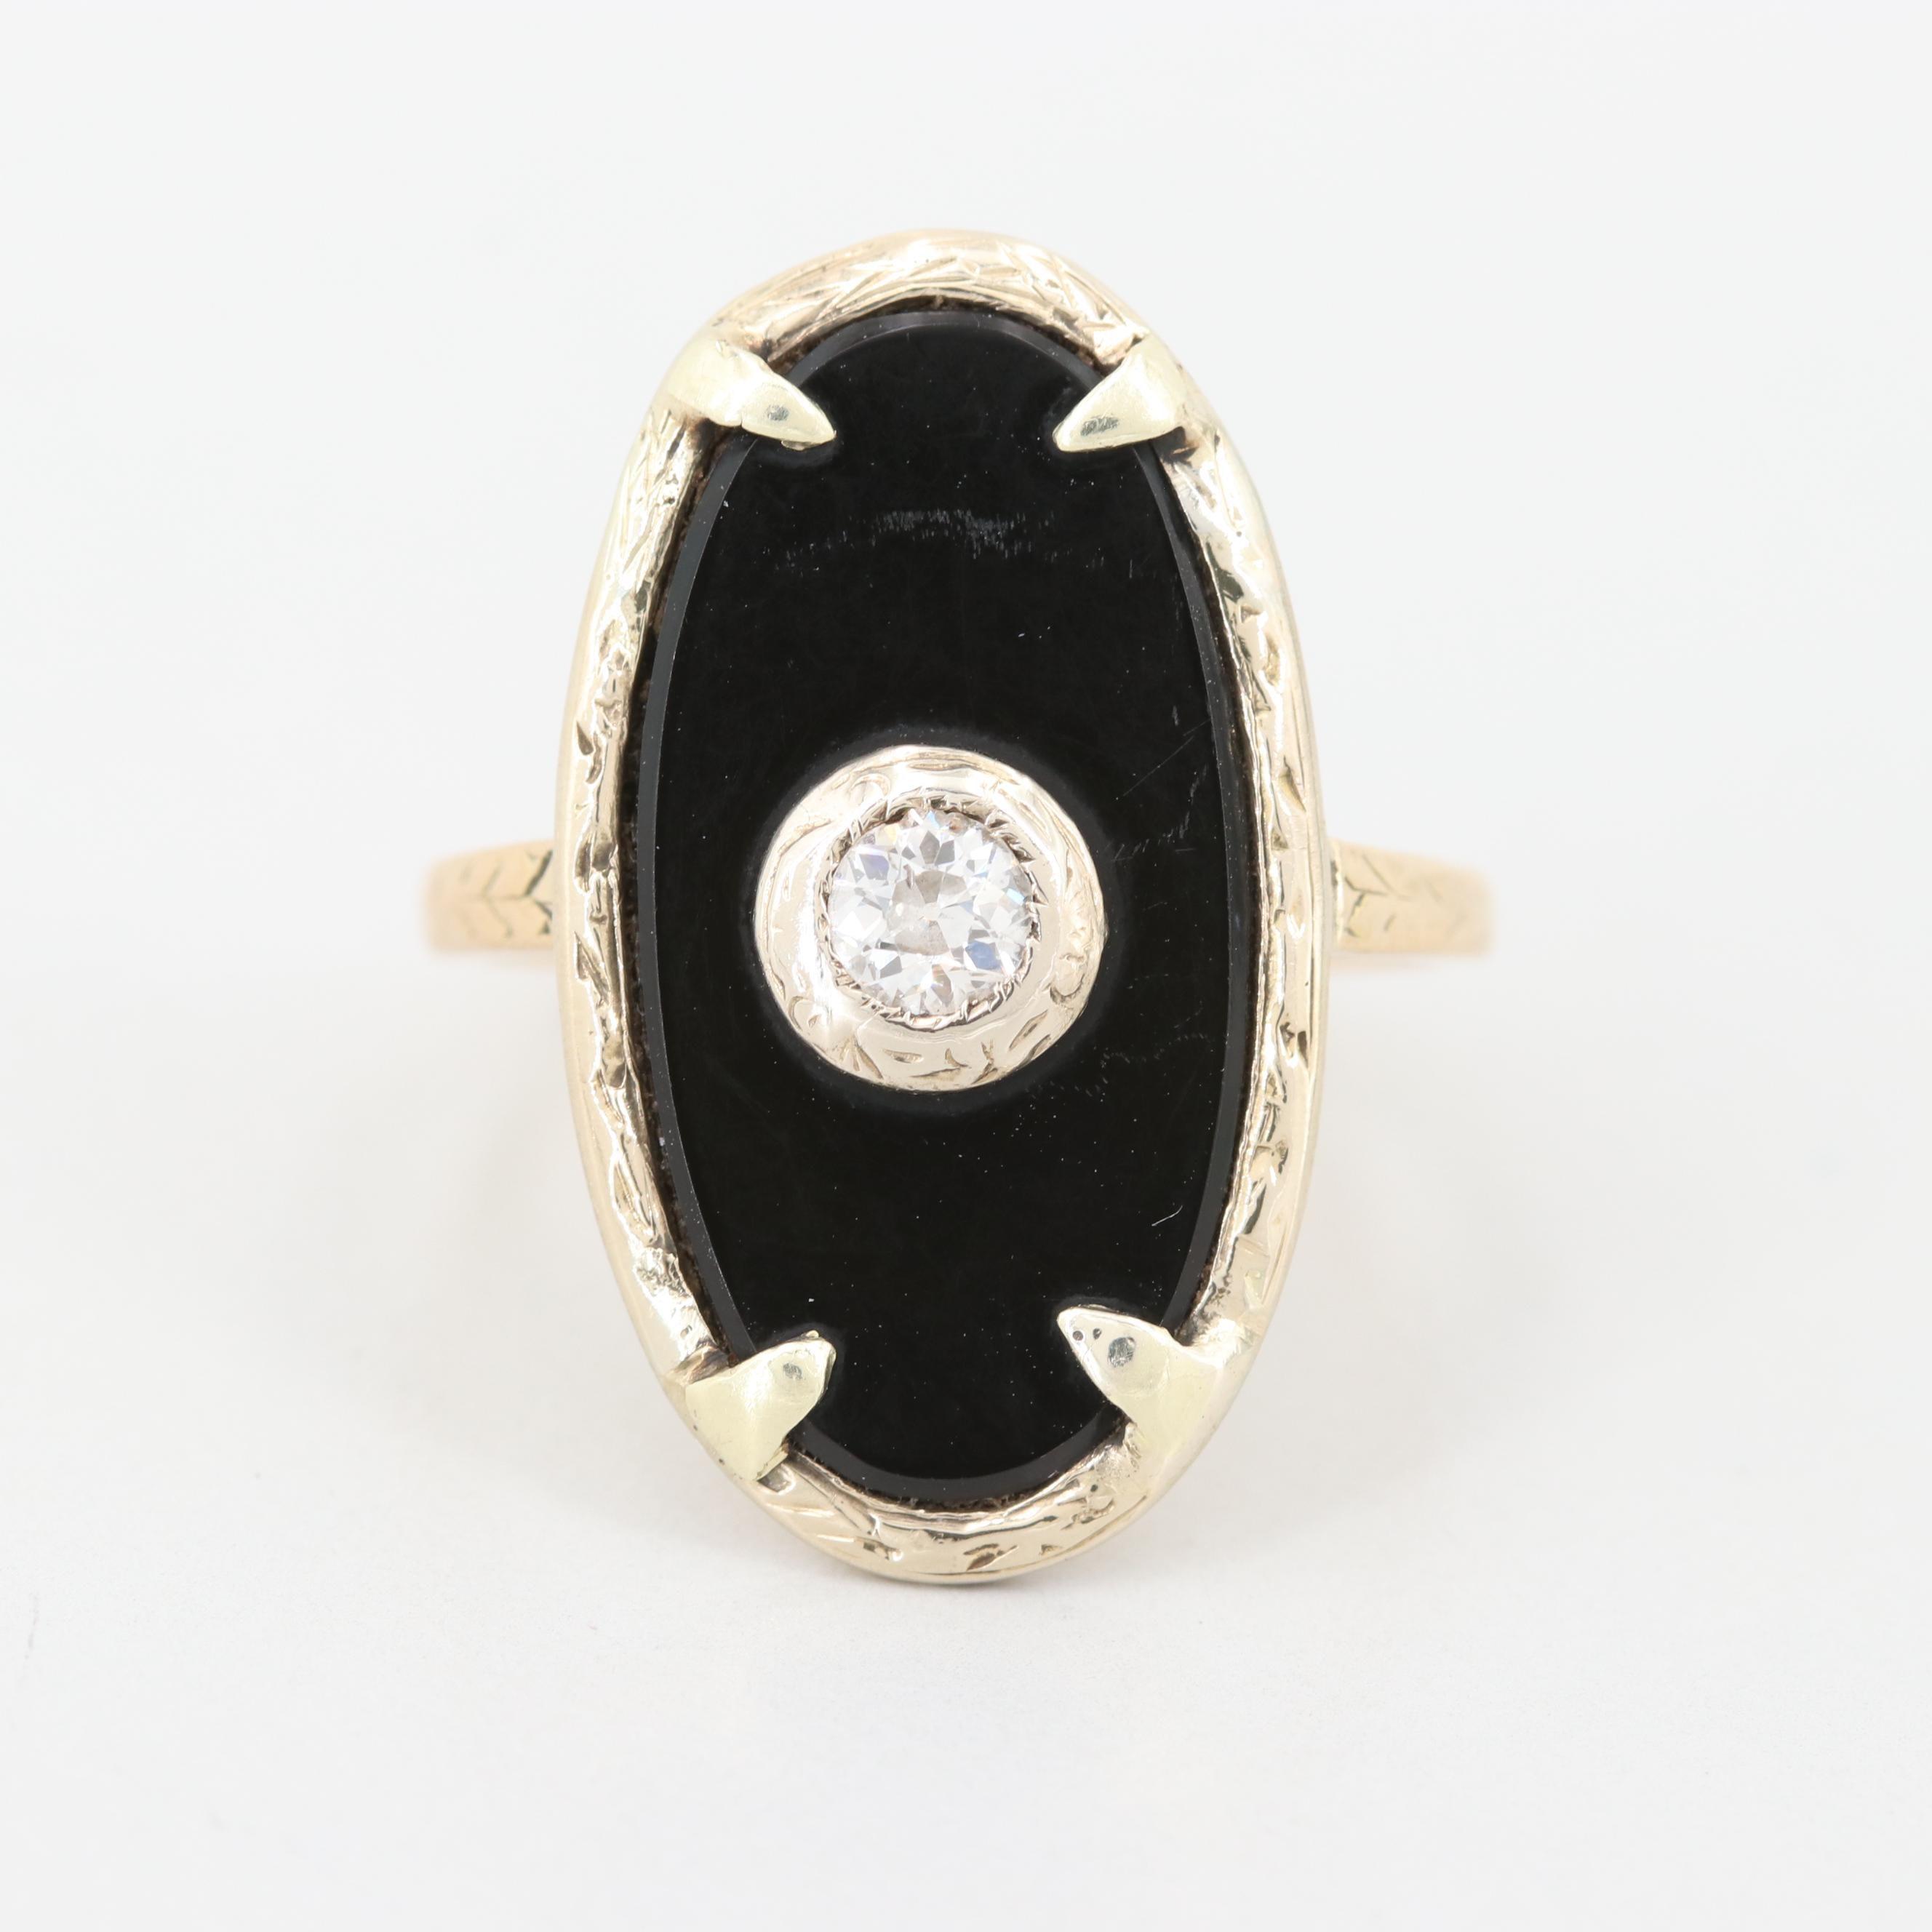 Circa 1900 14K Yellow Gold Diamond and Black Onyx Ring